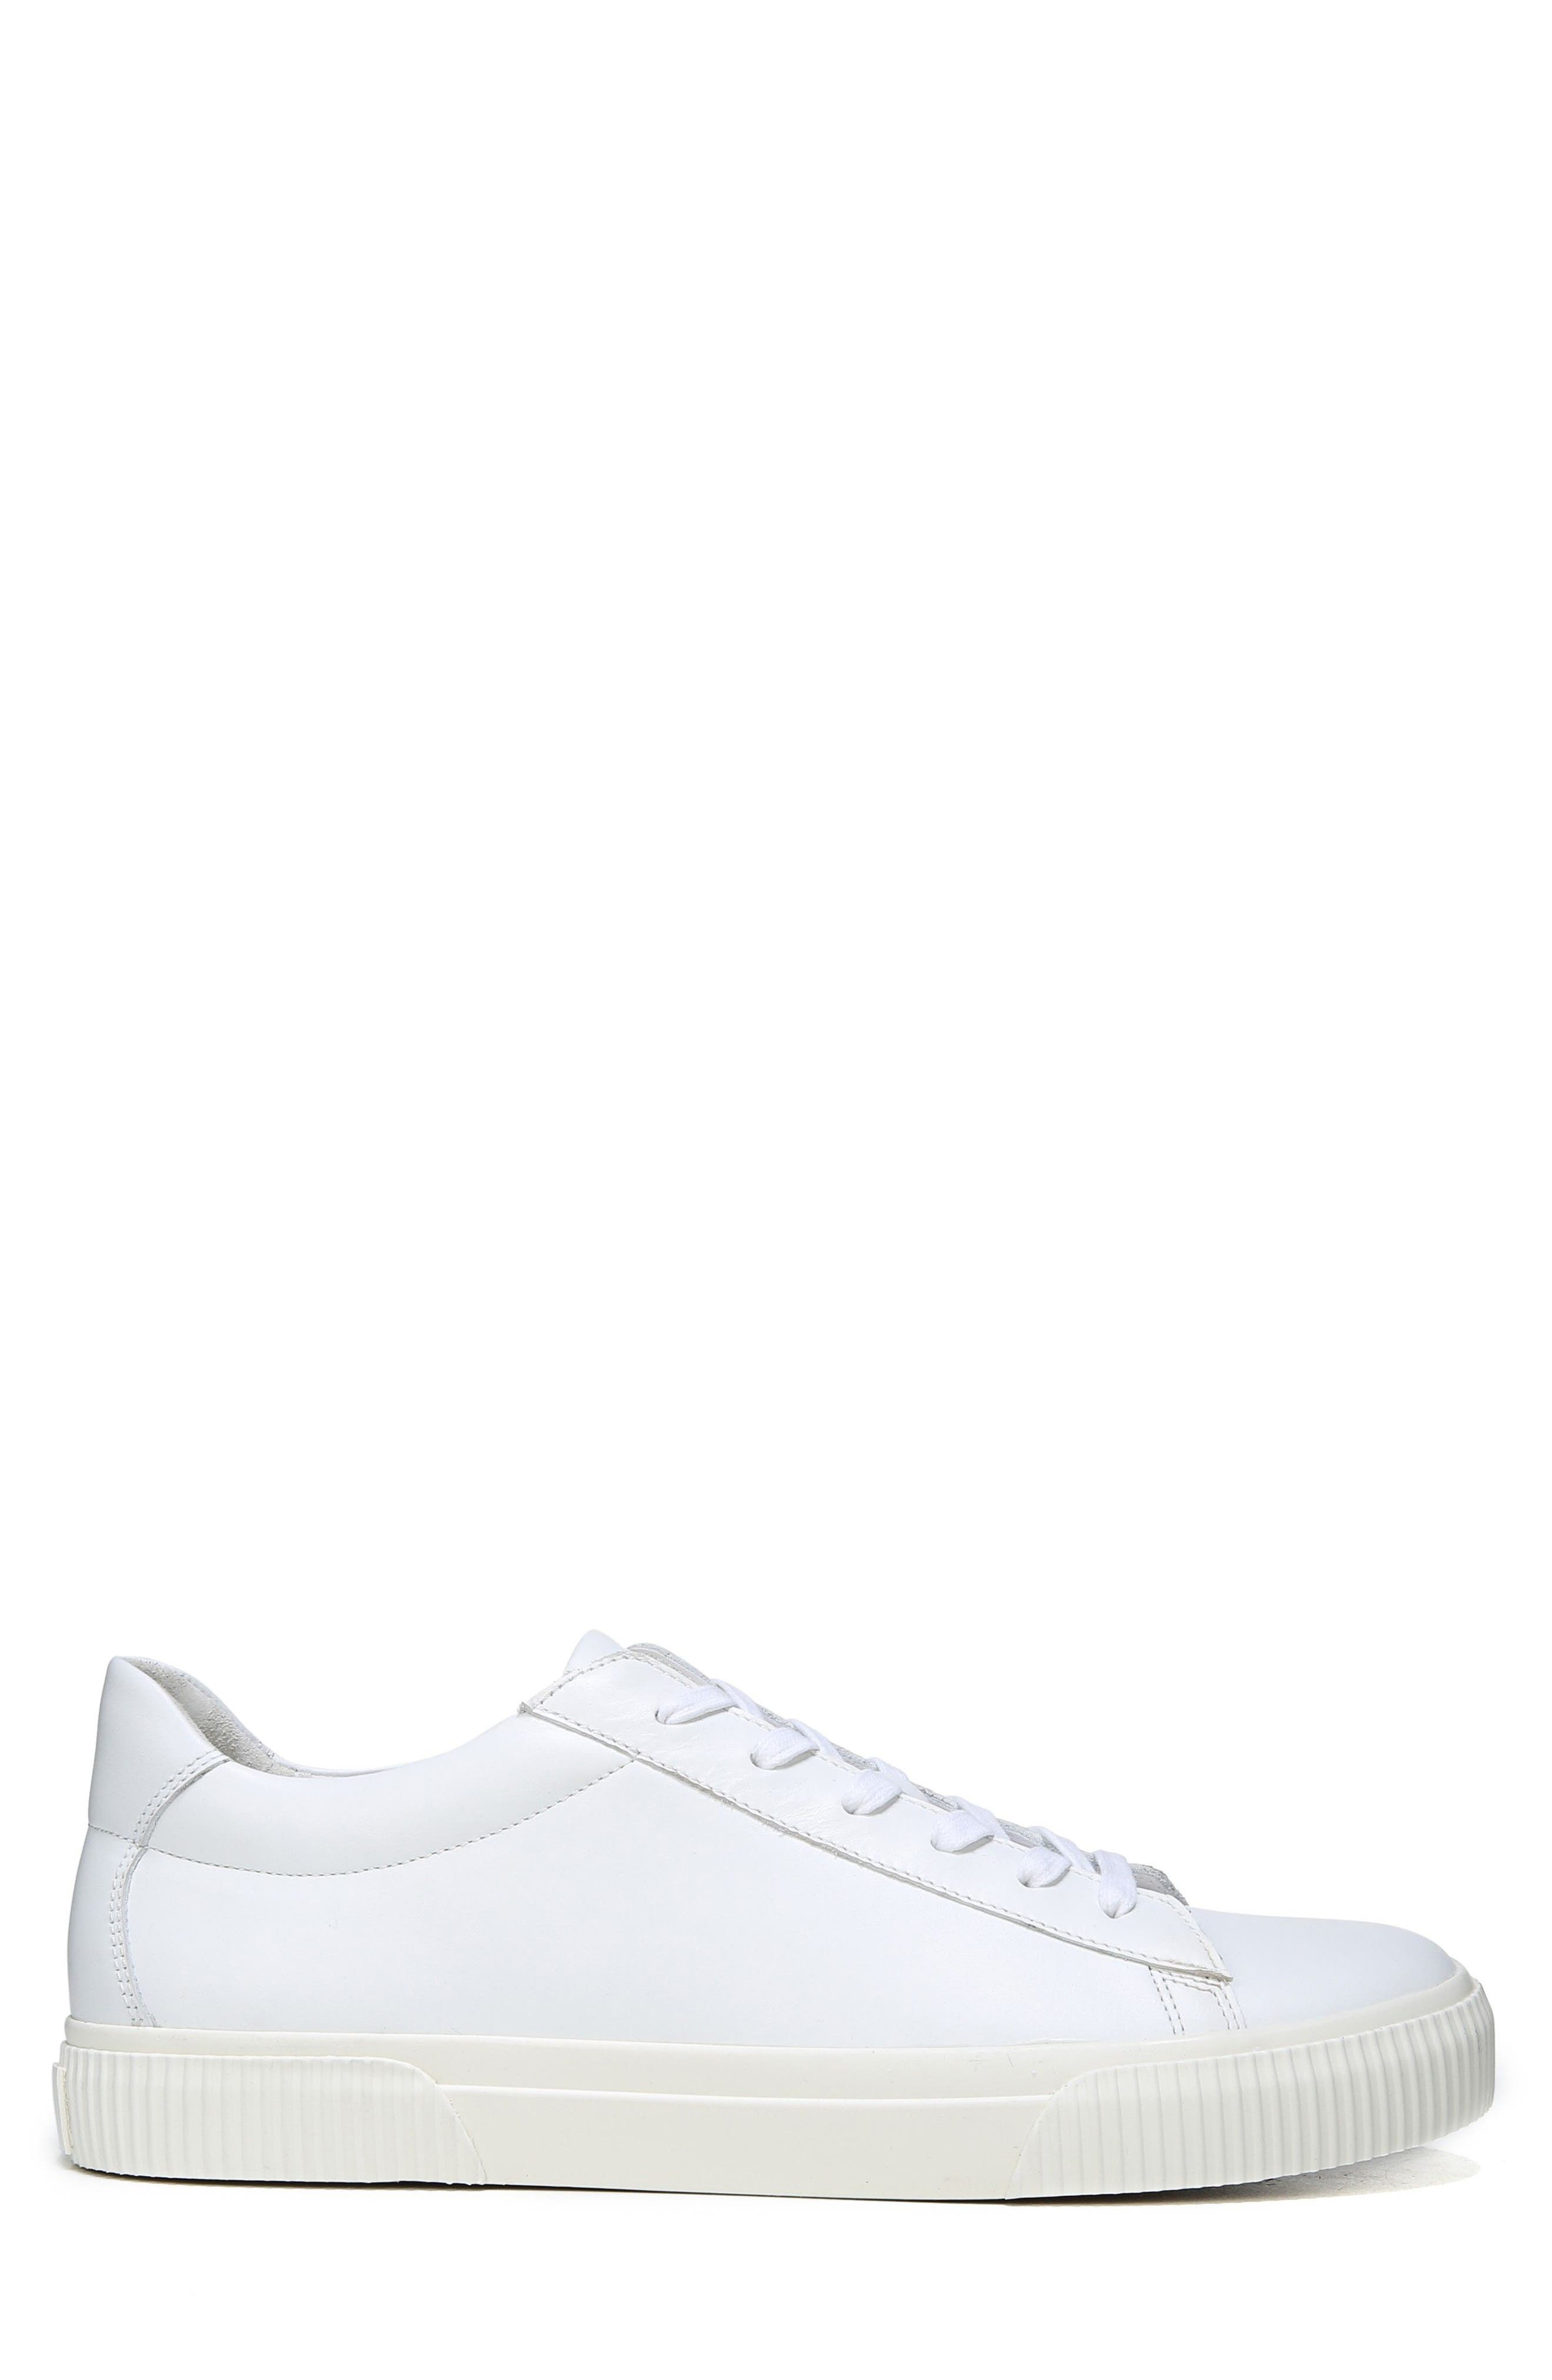 Kurtis Low Top Sneaker,                             Alternate thumbnail 3, color,                             White